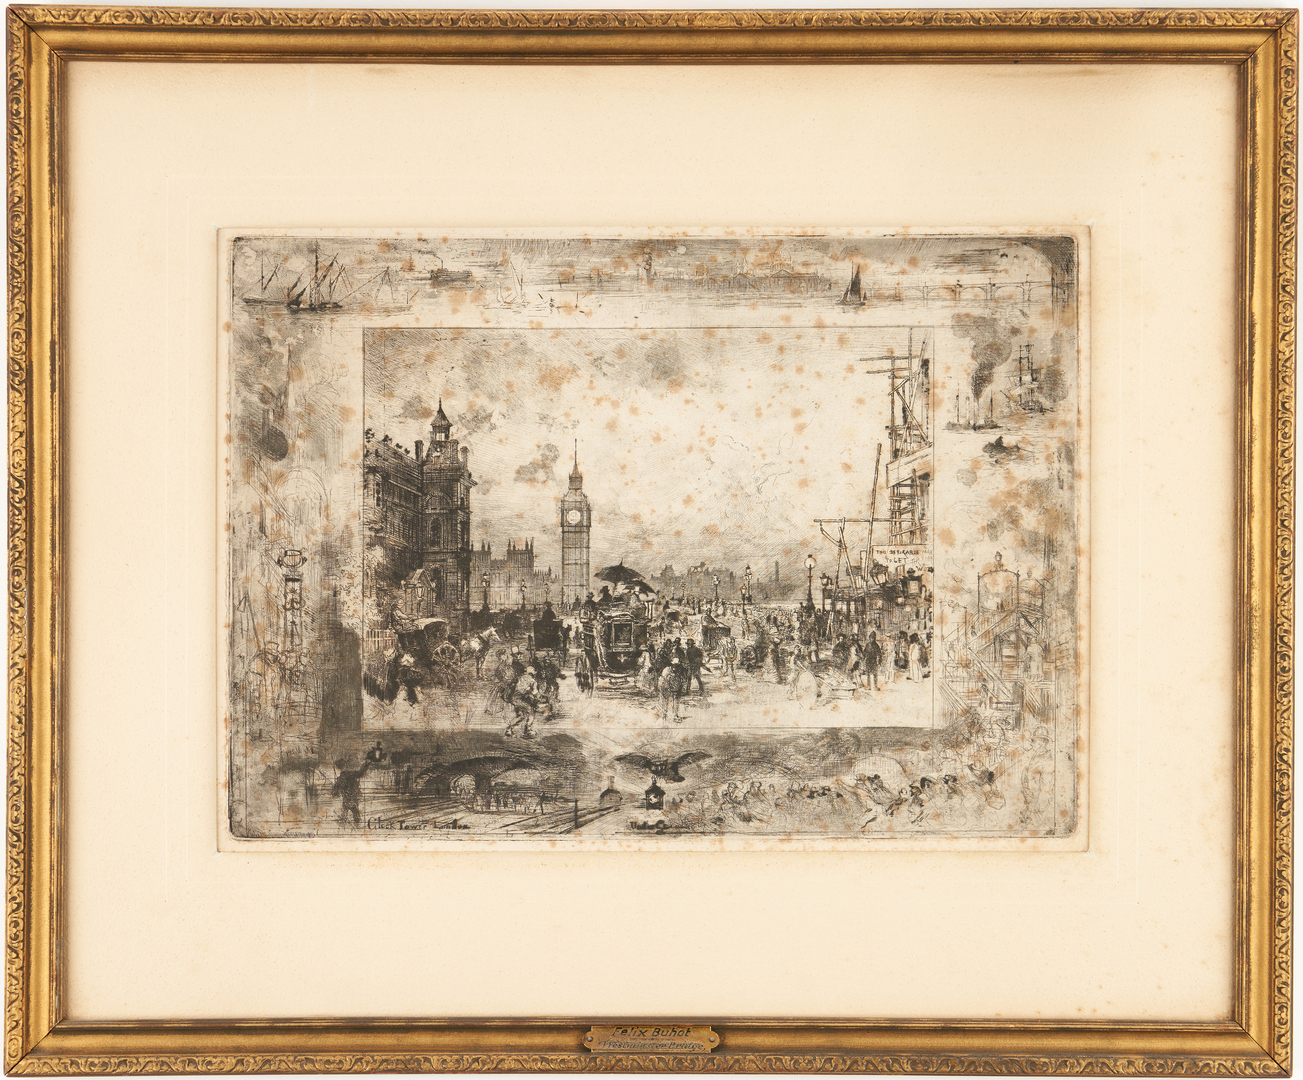 Lot 966: Felix Buhot Etching, Clock Tower London